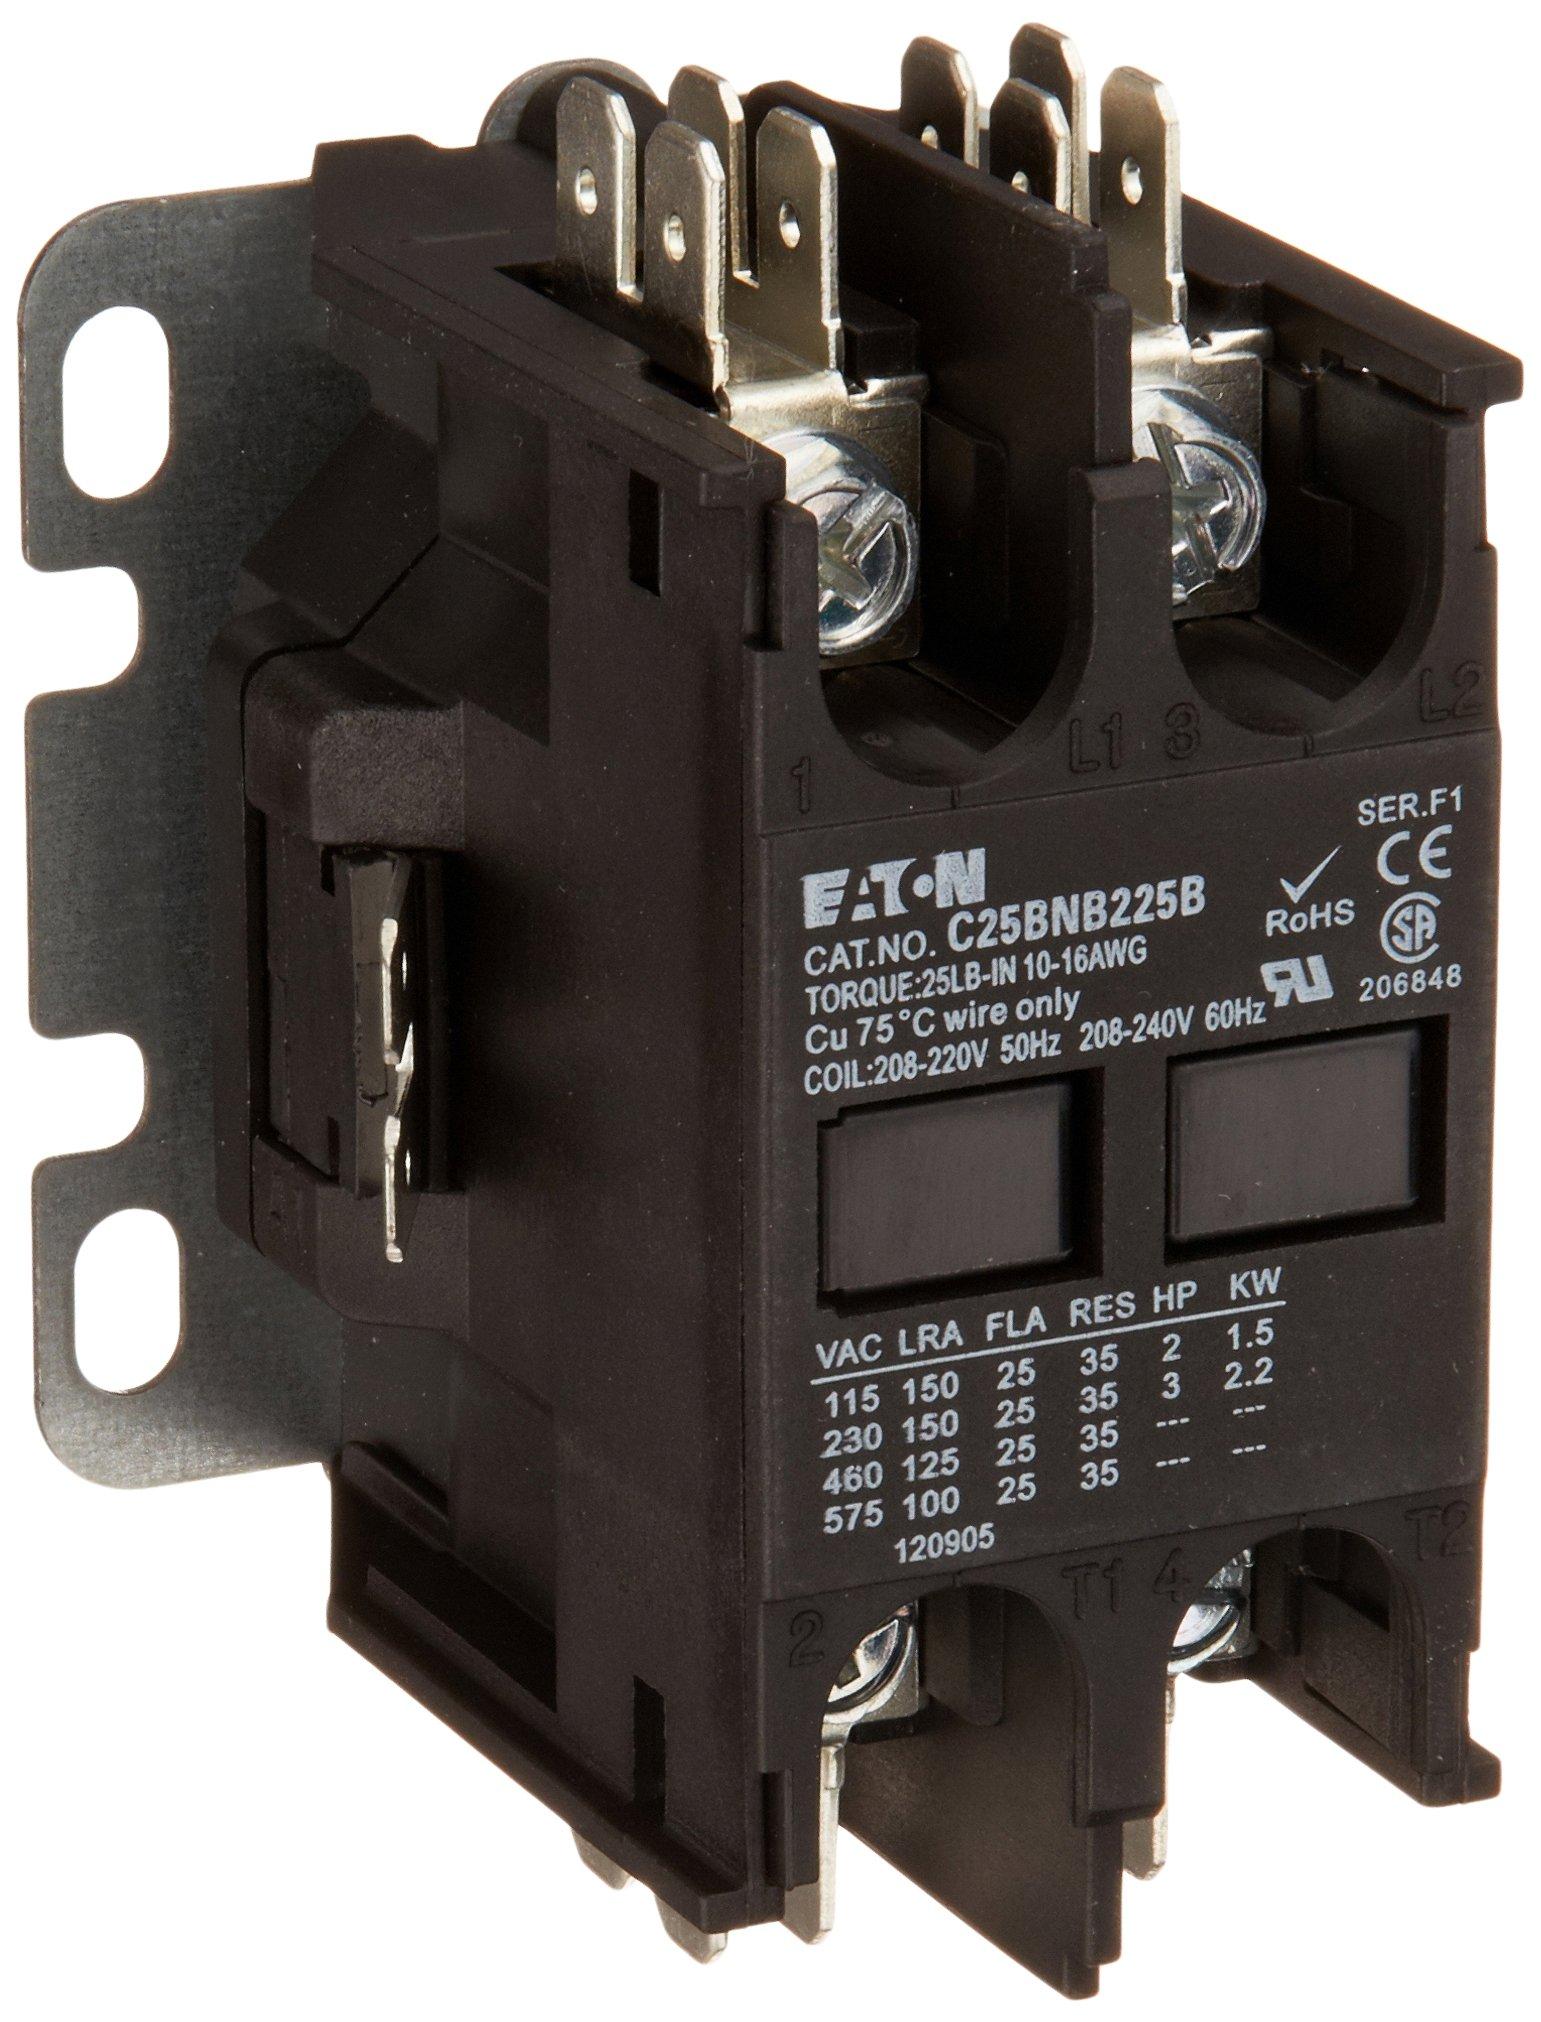 Eaton C25BNB225B Compact Definite Purpose Contactor, 25A Inductive Current Rating, 2 Max HP Rating at 115V, 3 Max HP Rating at 230V, 240VAC Coil Voltage